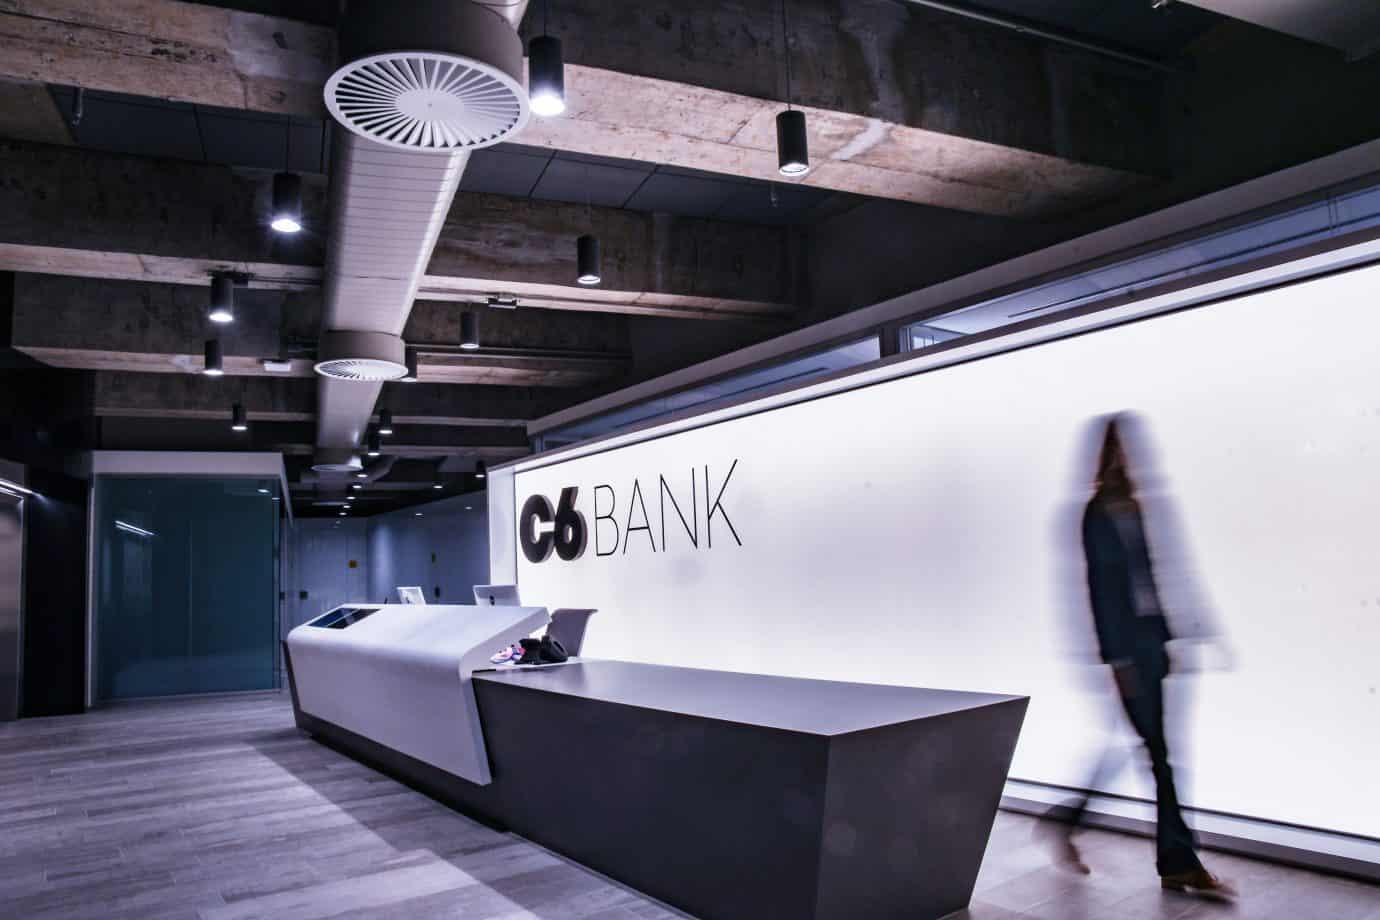 C6 Bank anuncia possibilidade de realizar investimentos dentro e fora do Brasil